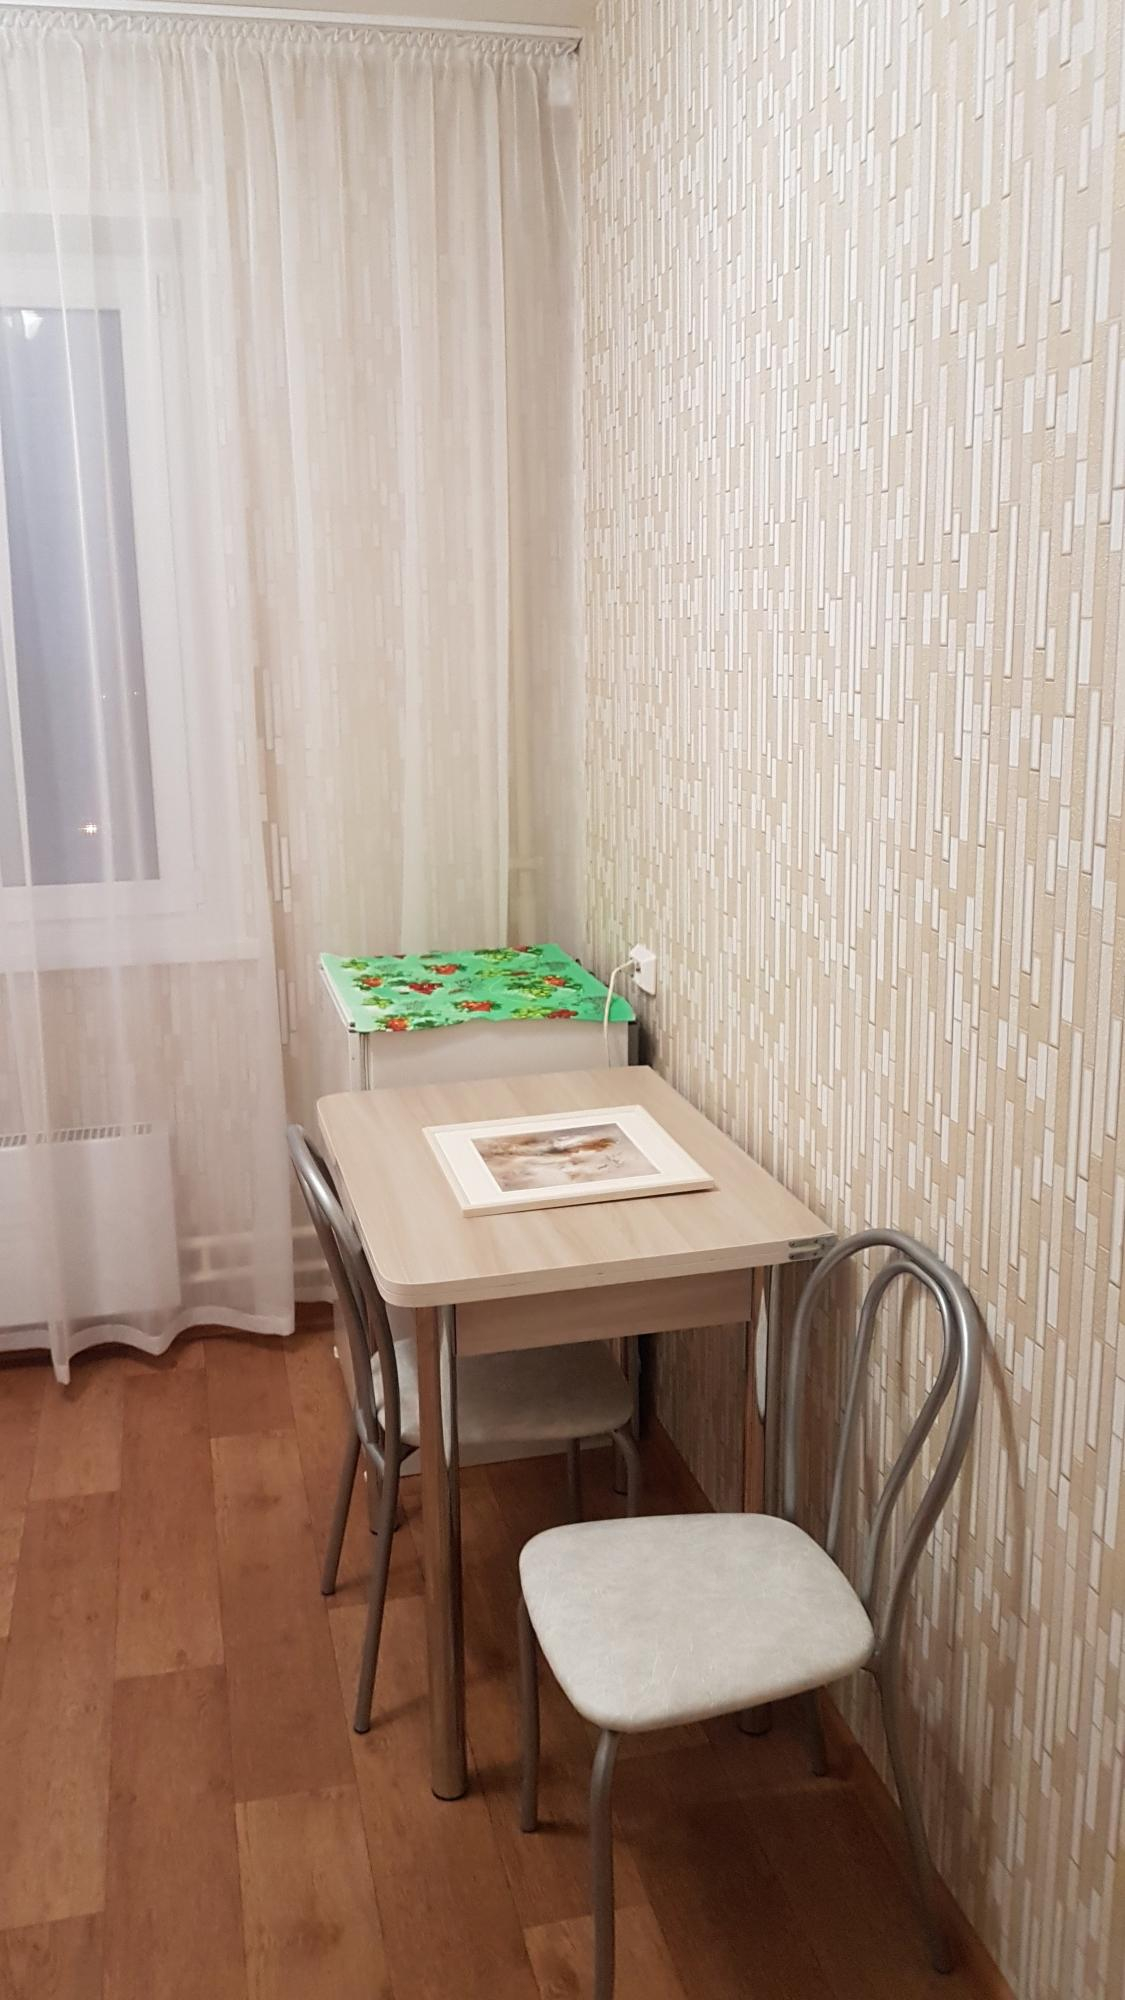 1к квартира улица Партизана Железняка, 61 | 20000 | аренда в Красноярске фото 6